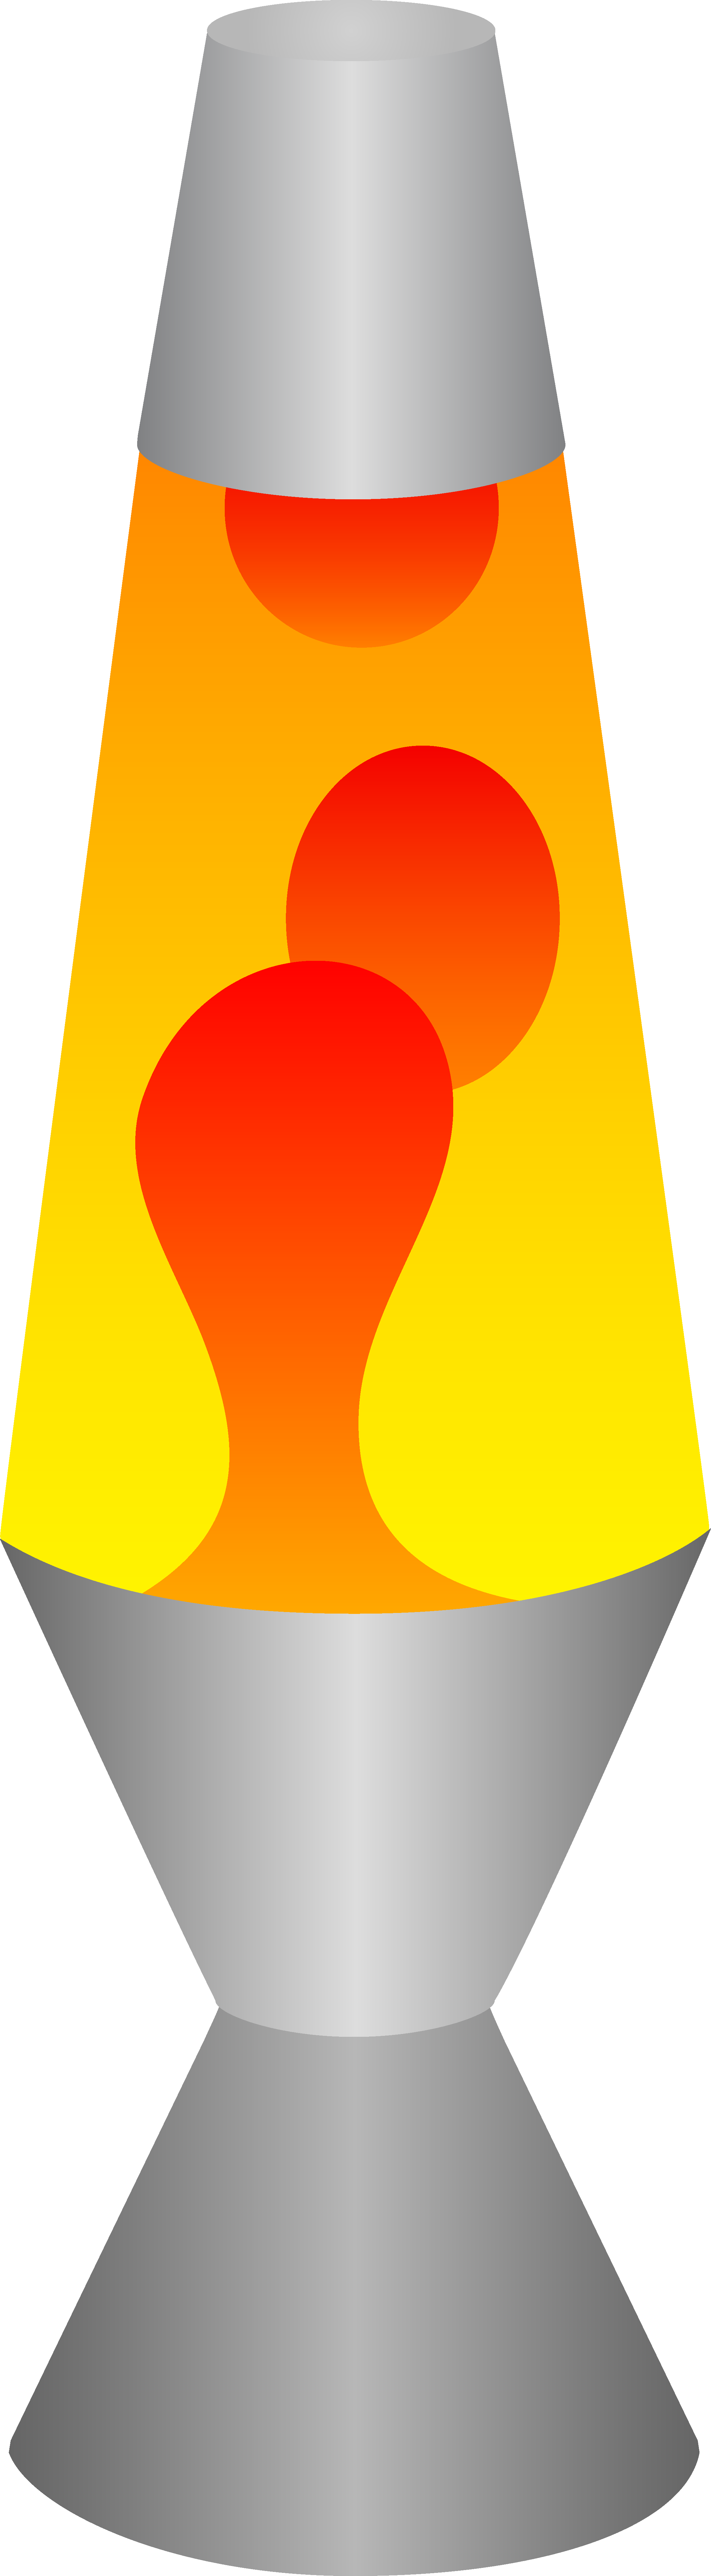 Lava lamp clipart.